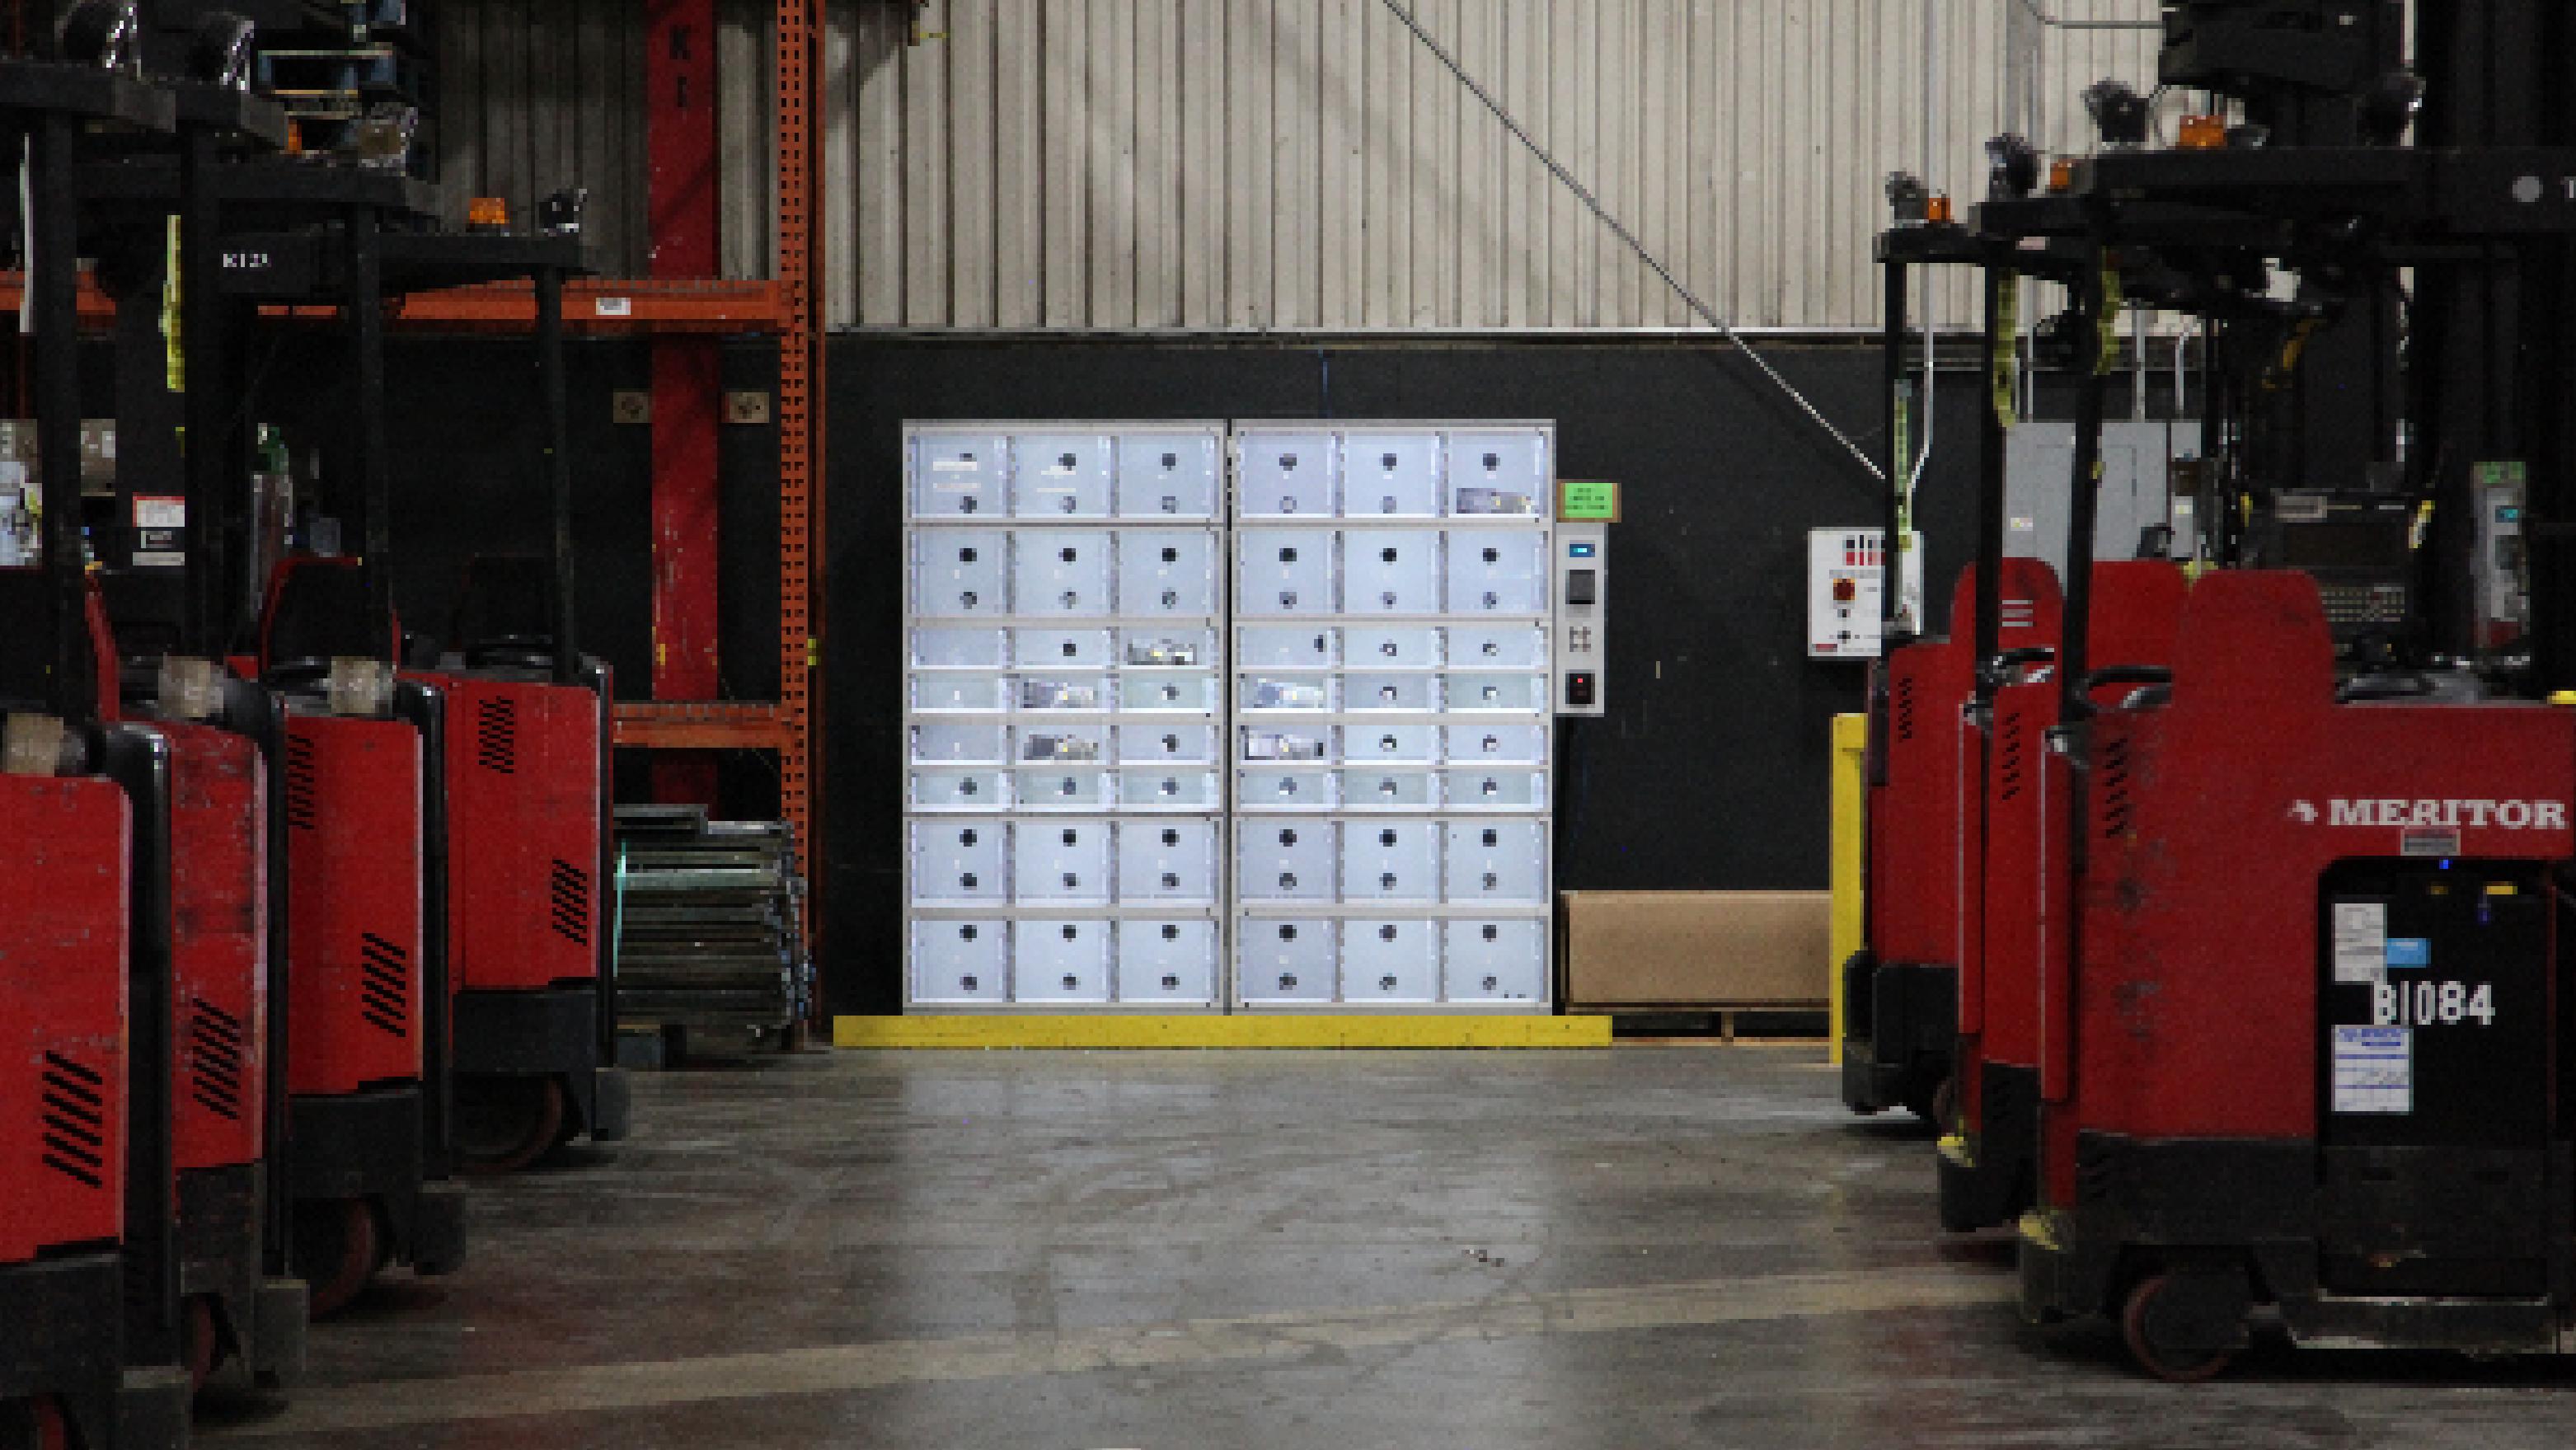 Meritor distribution center